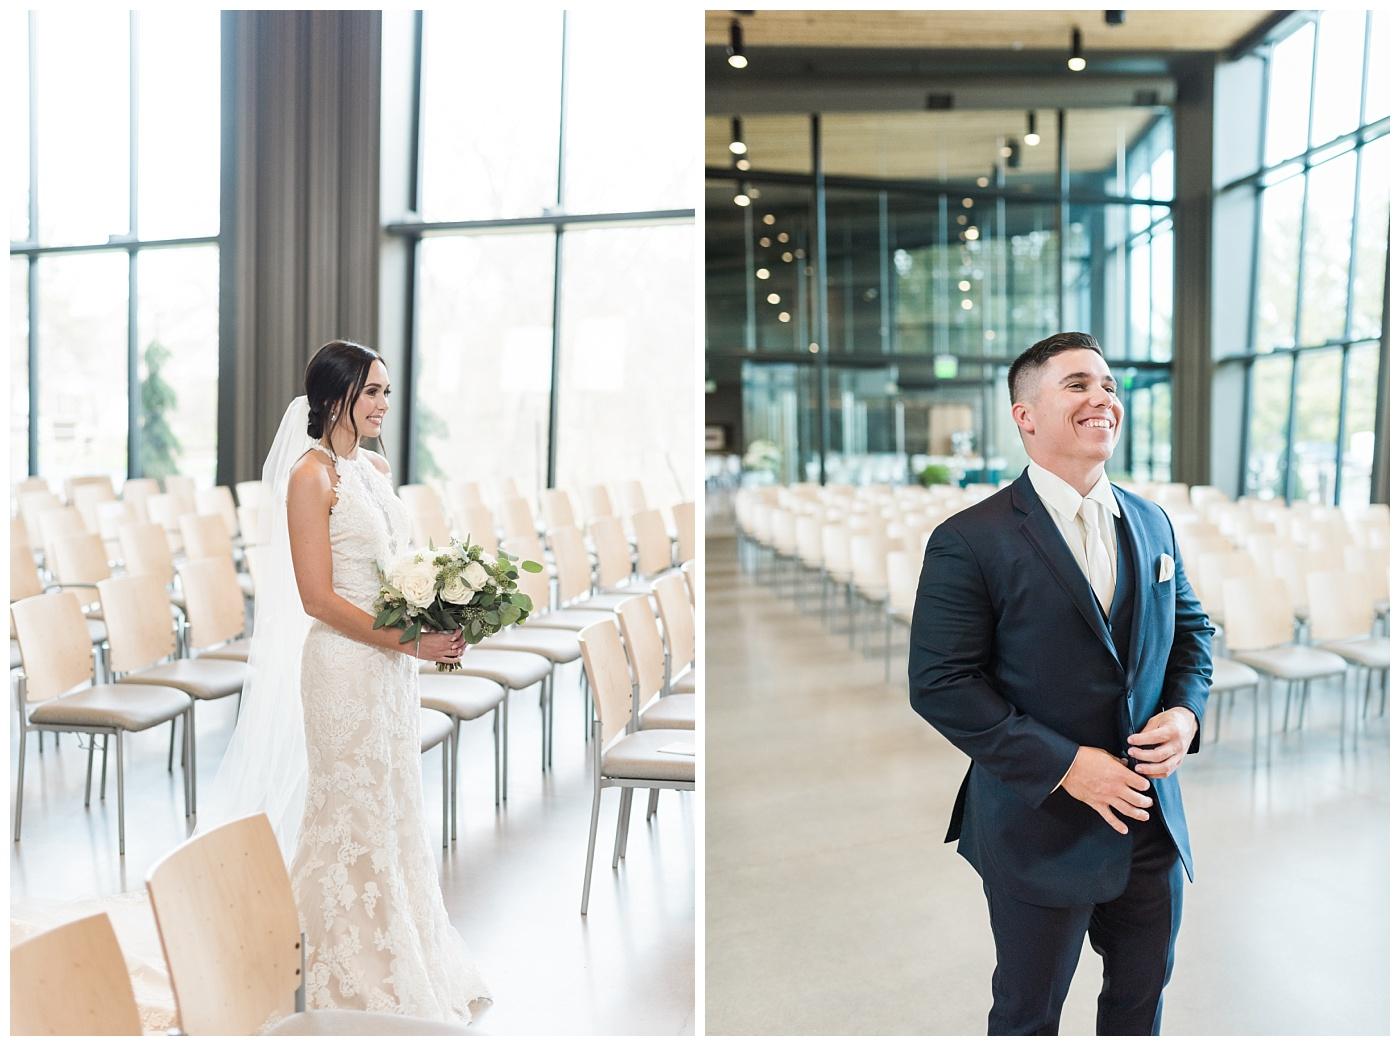 Stephanie Marie Photography Unitarian Universalist Society Church Ceremony Hotel Kirkwood Reception Cedar Rapids Iowa City Wedding Photographer Sean Madison Moore_0027.jpg